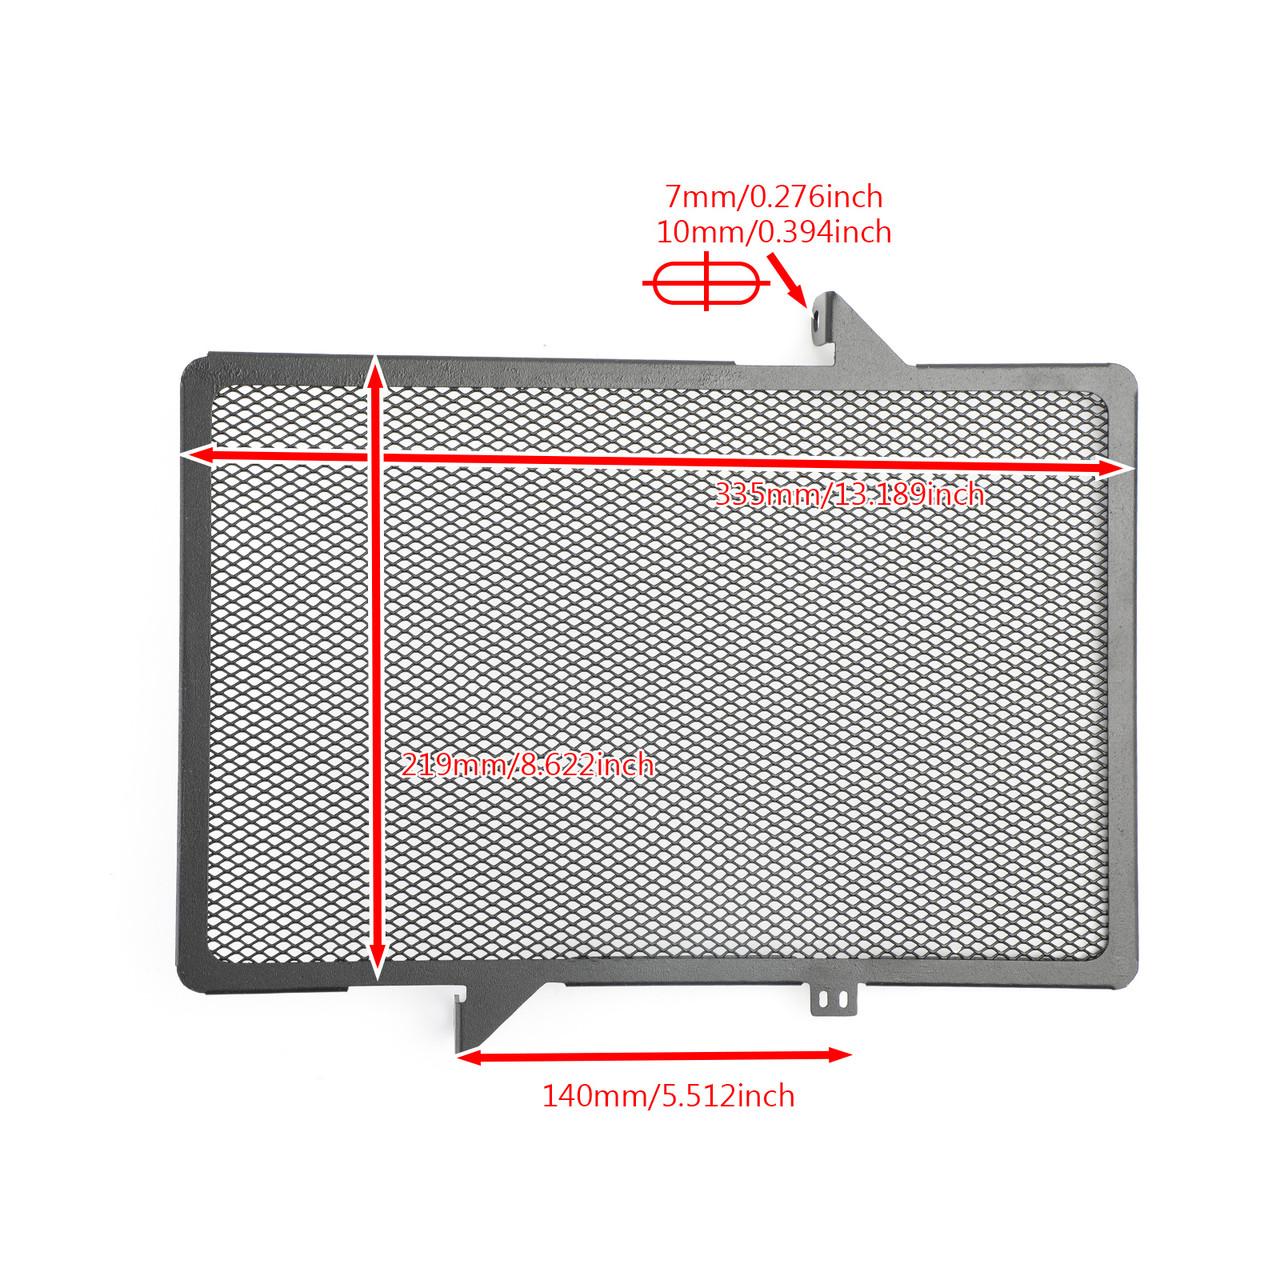 Radiator Guard Grill Protector for Honda CB650F/CBR650F 14-18 CB650R/CBR650R 19